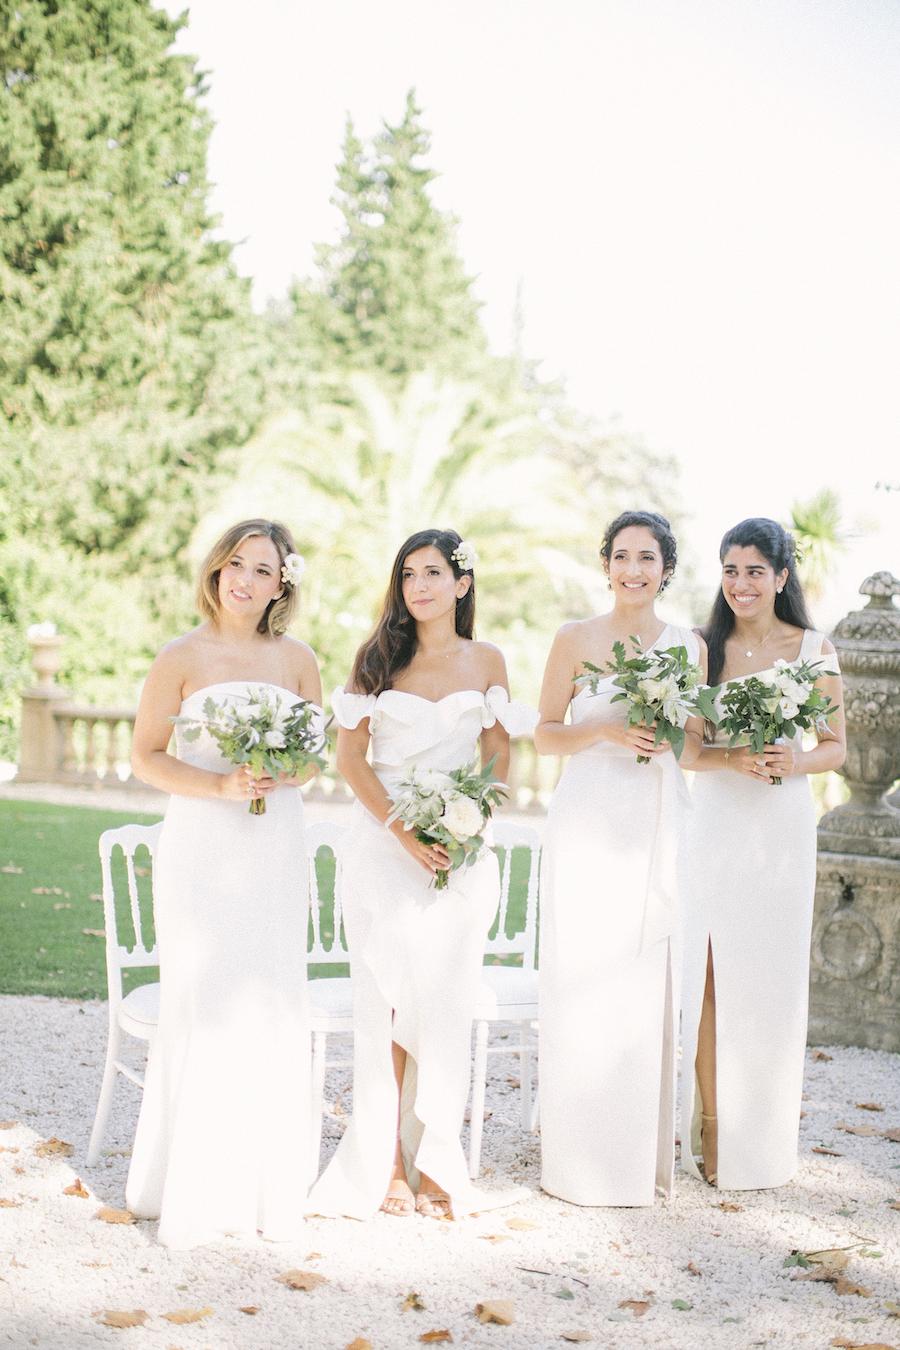 saya-photography-wedding-photographer-provence-chateau-de-robernier-50.jpg